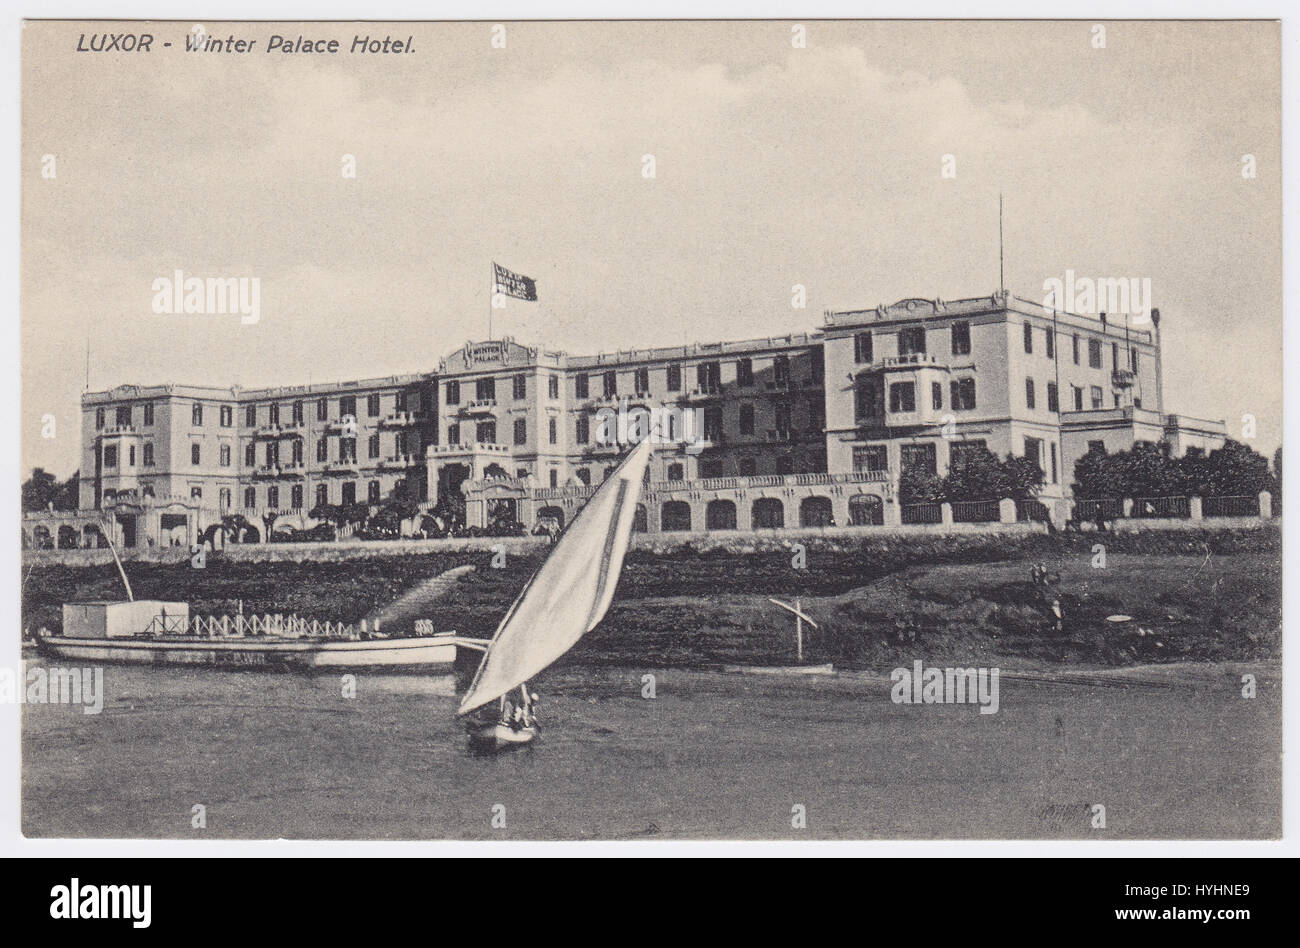 Winter Palace Hotel, Luxor, Egypt - Stock Image